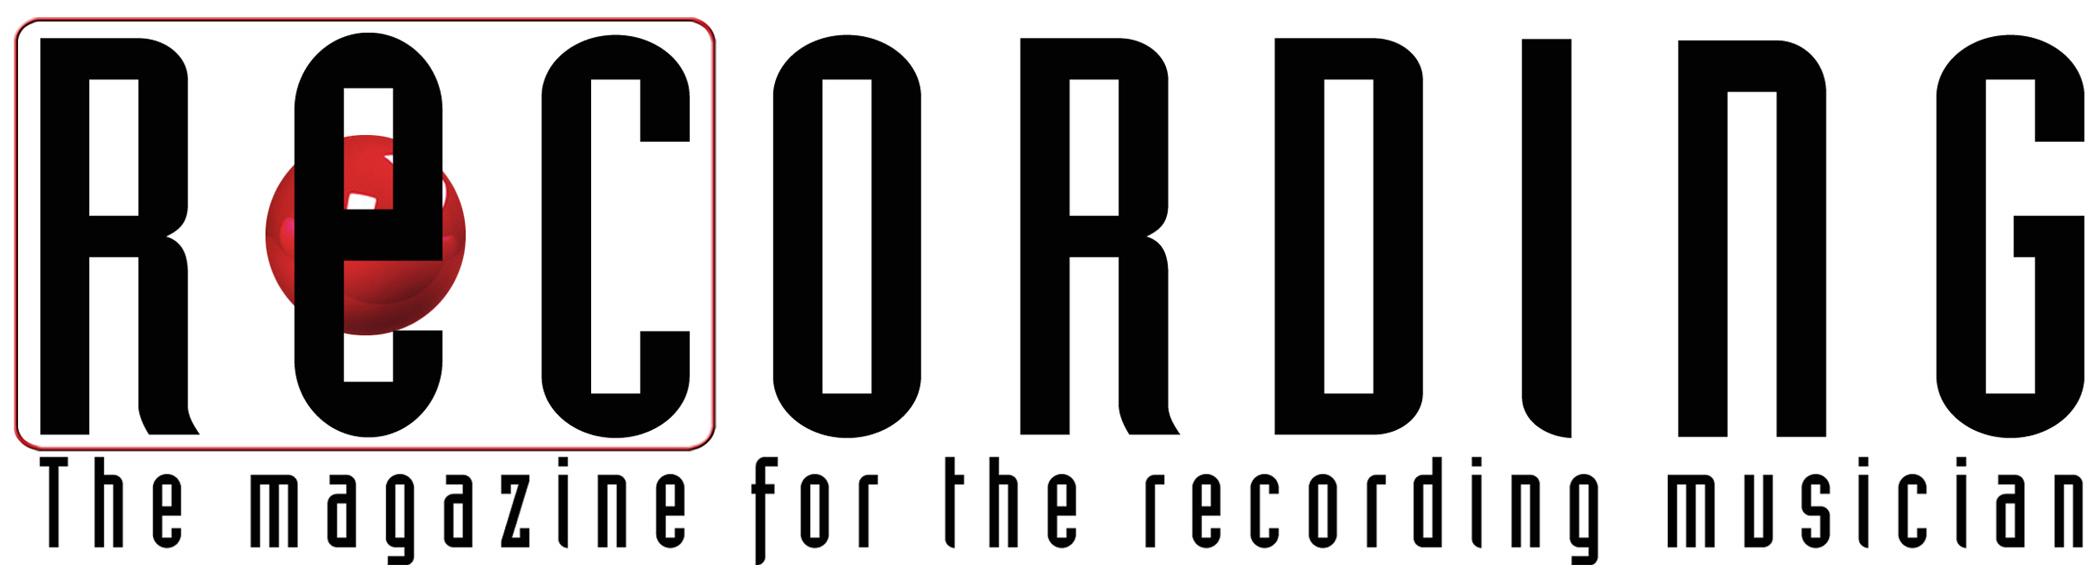 recording_logo.jpg